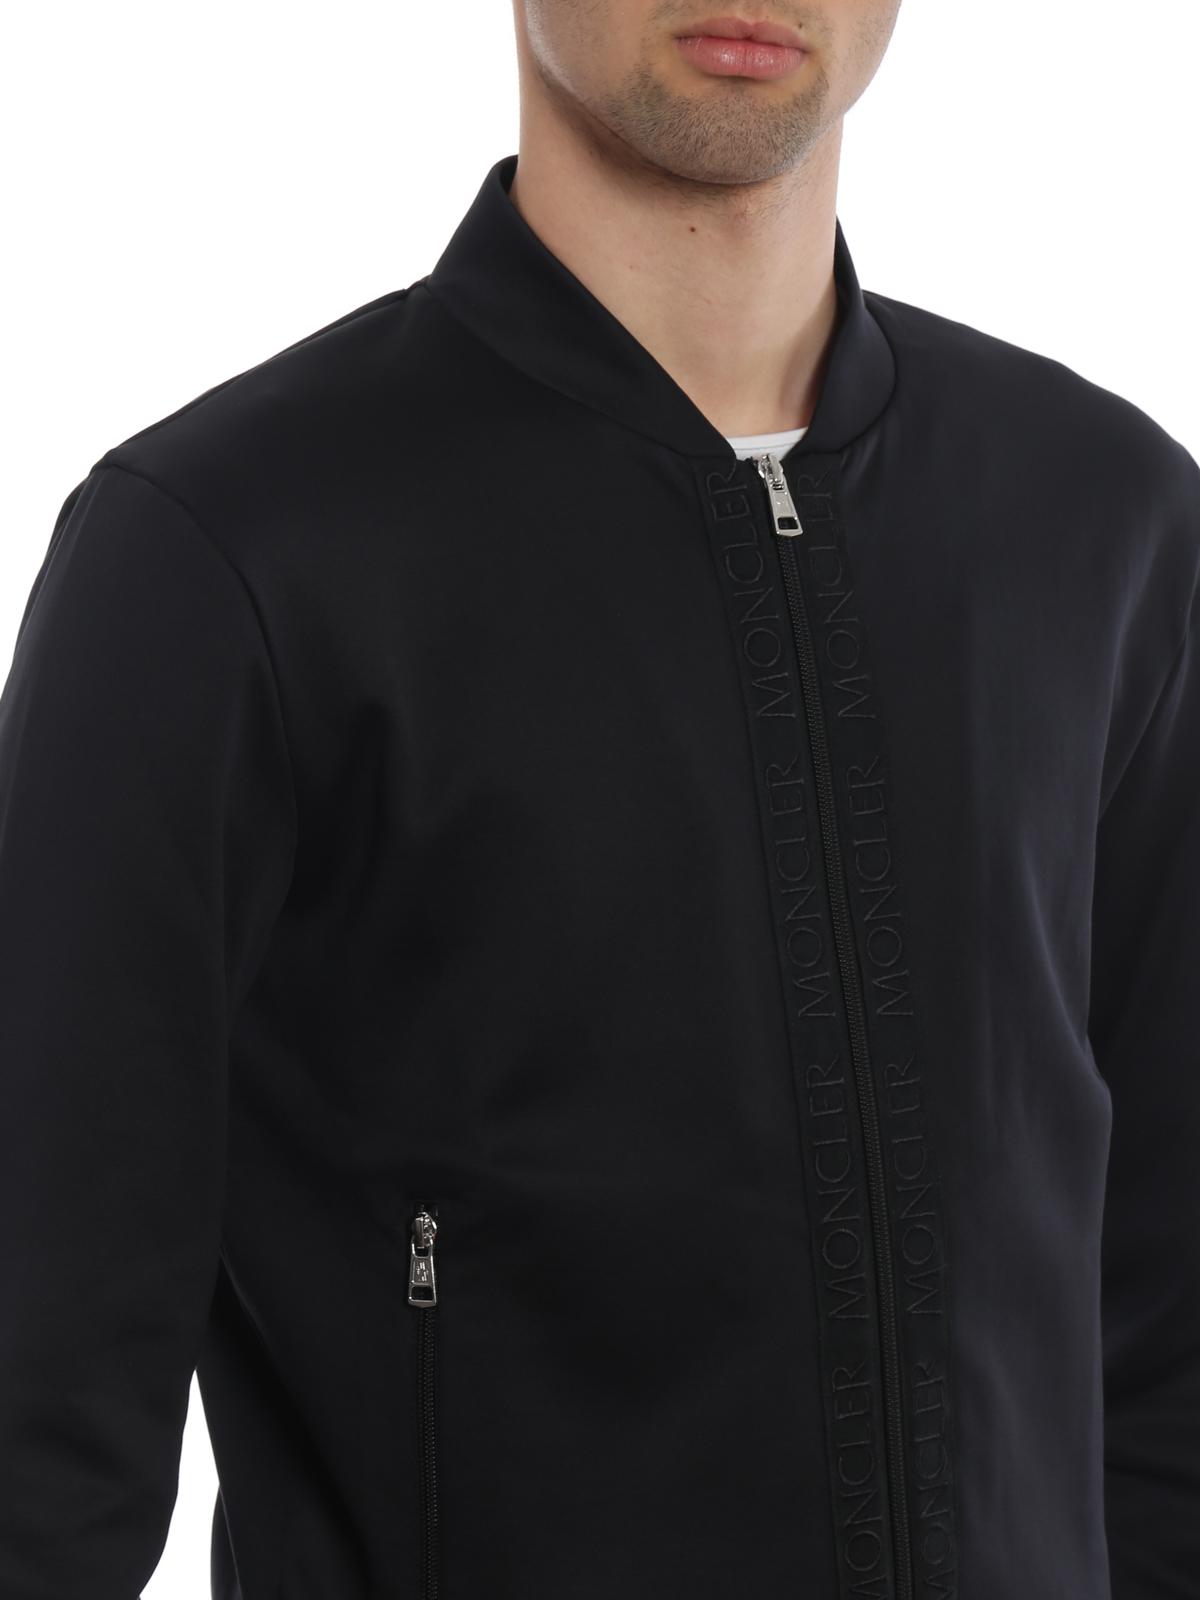 8ed4b0f25 Moncler - Logo bands black sweatshirt - Sweatshirts   Sweaters - D1 ...